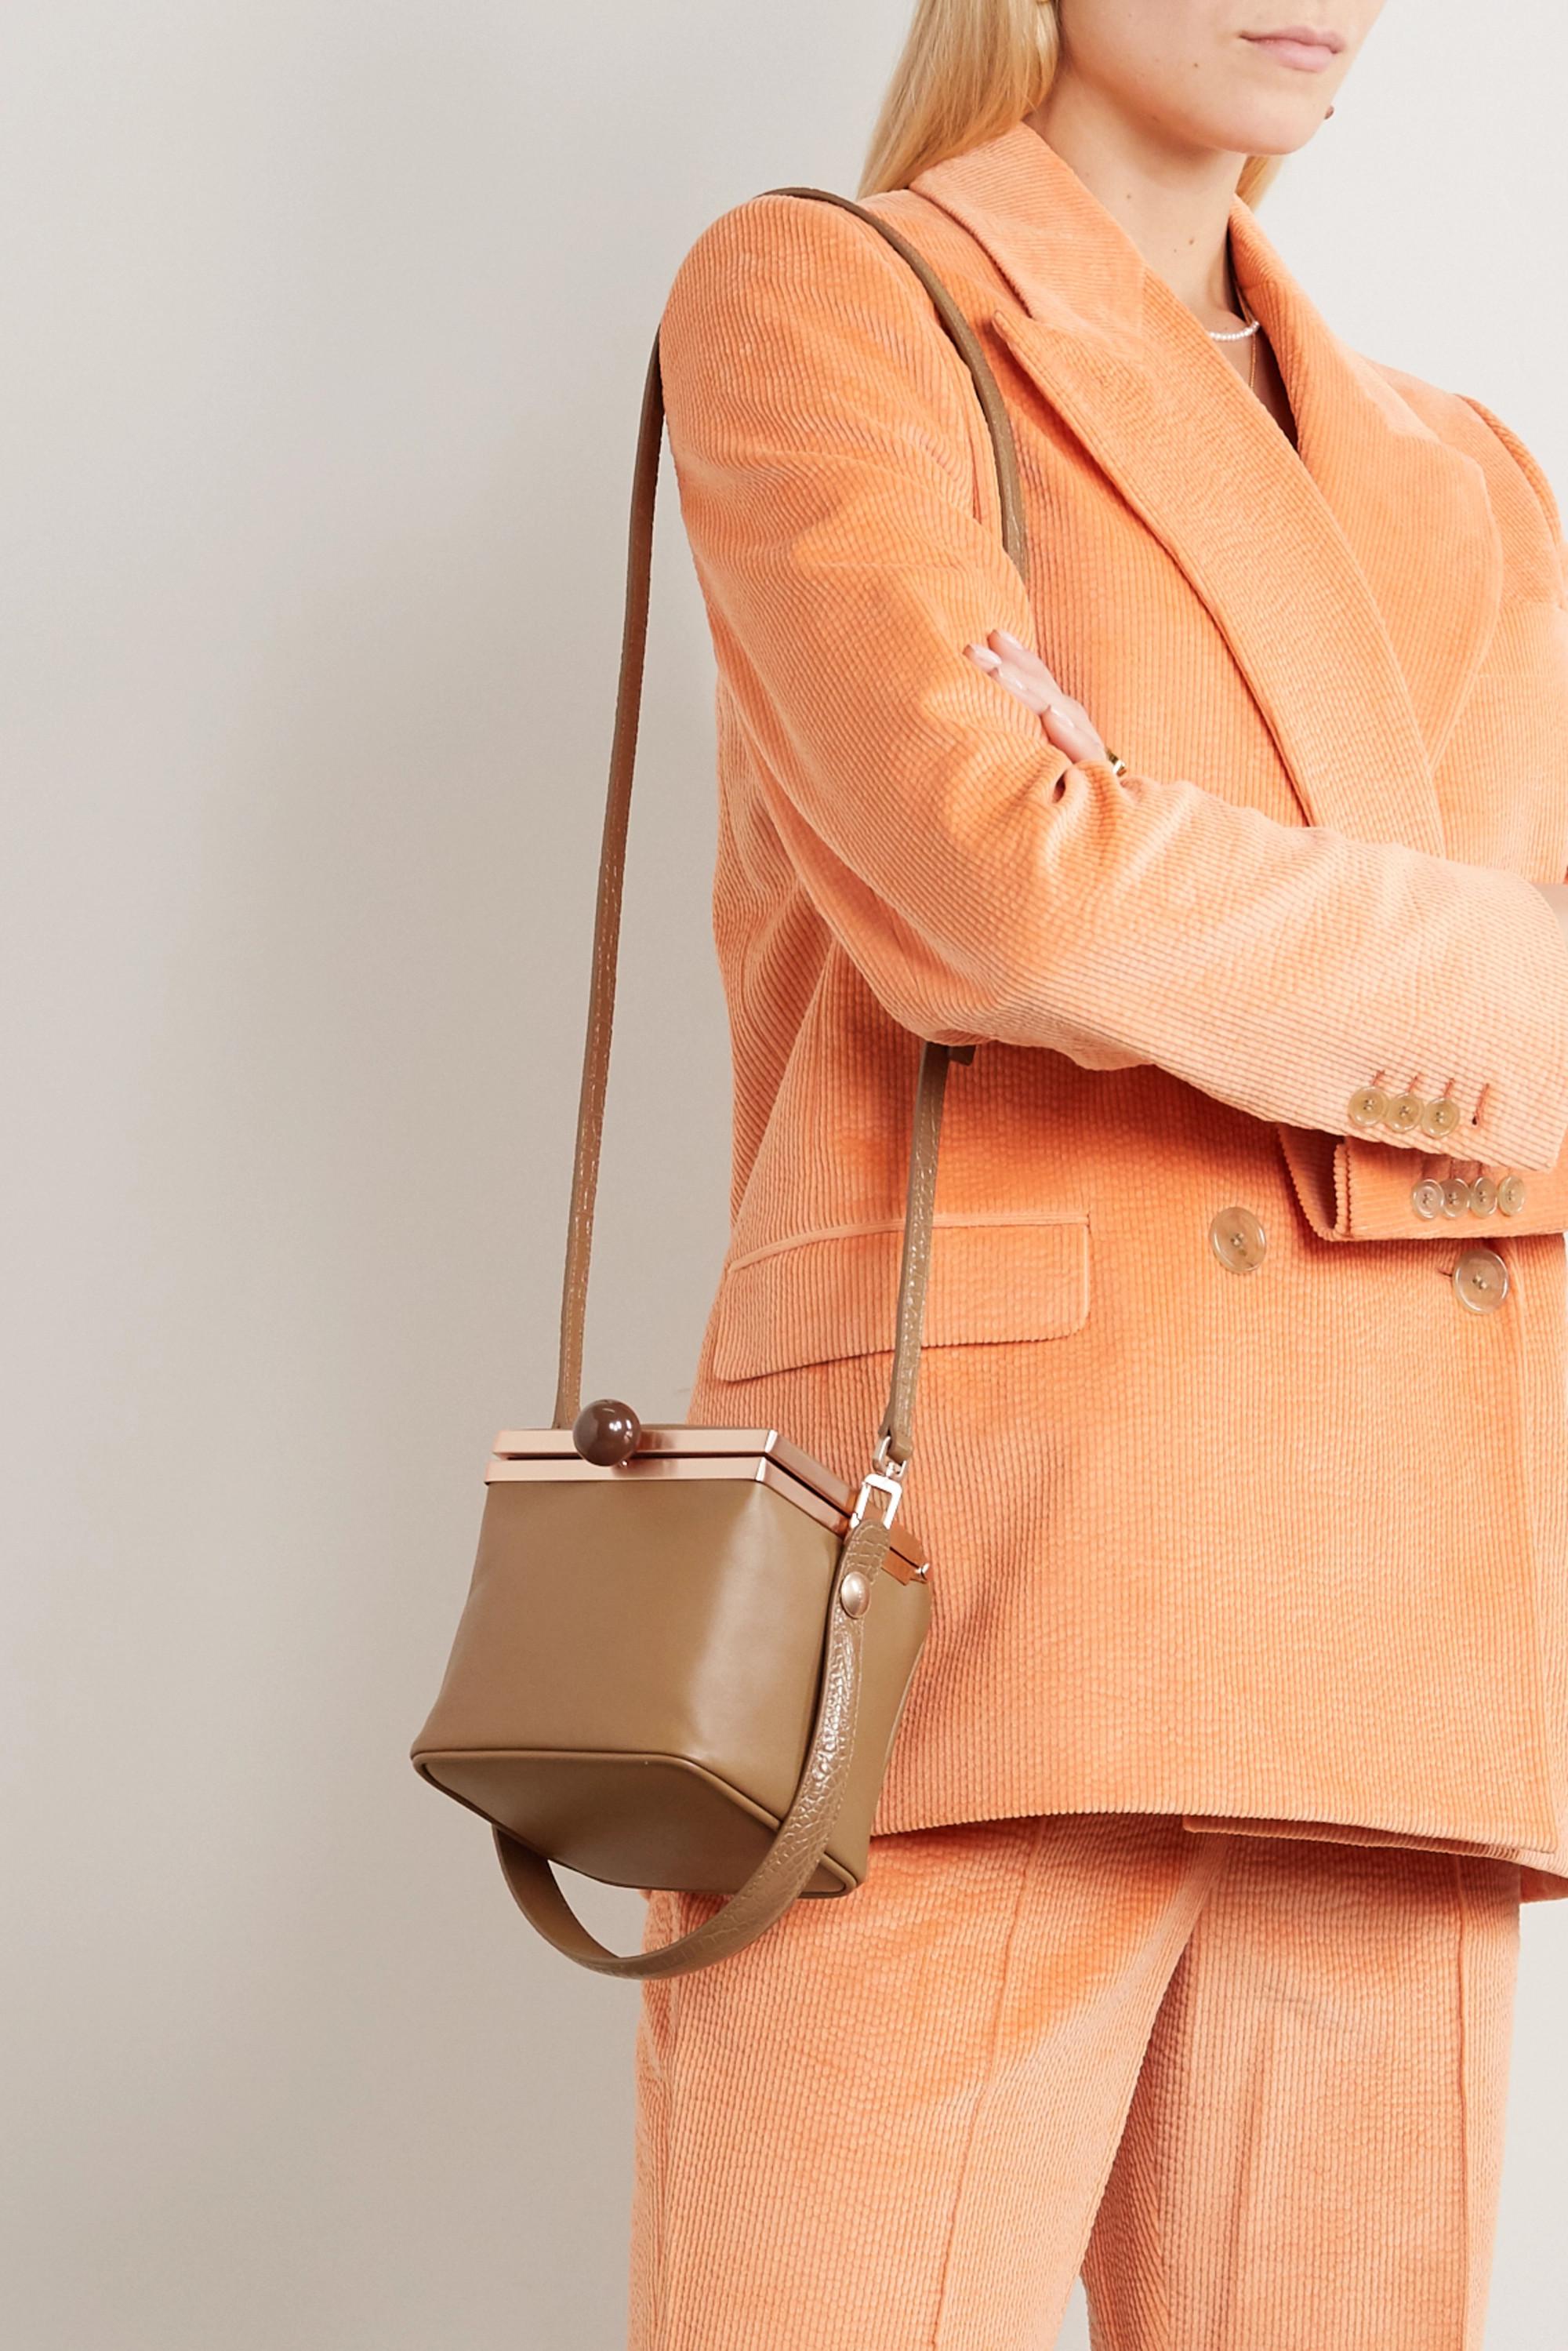 Gu_de Dona leather shoulder bag